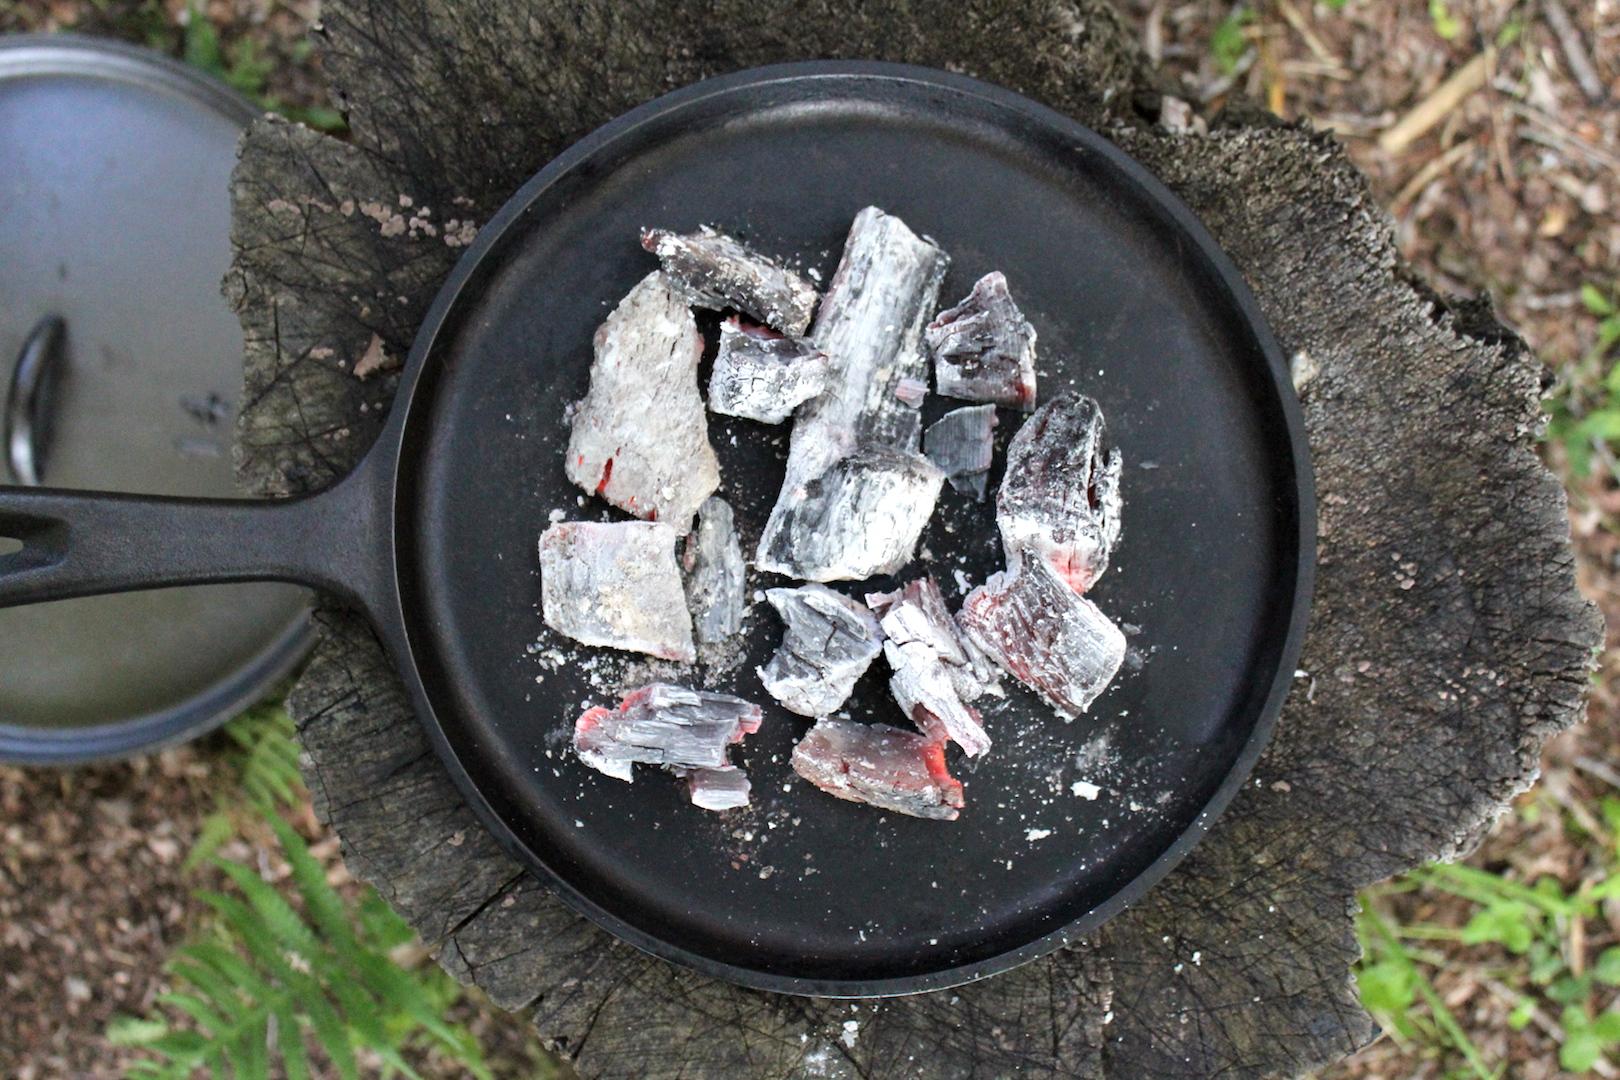 Coals on Griddle for Under Dutch Oven